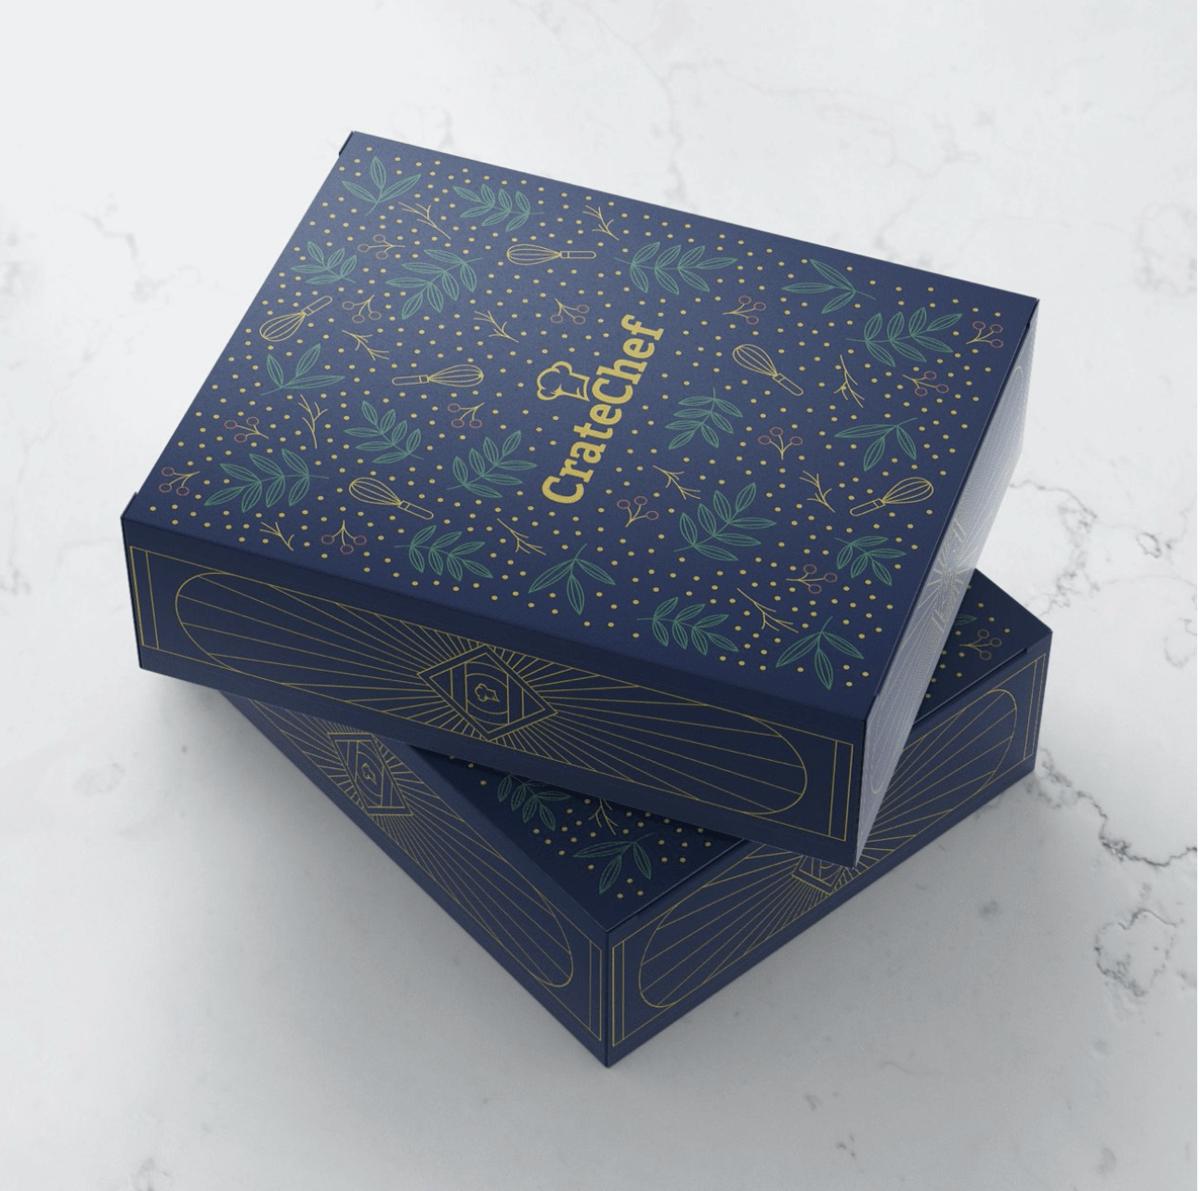 CrateChef 2020 Advent Calendar – On Sale Now